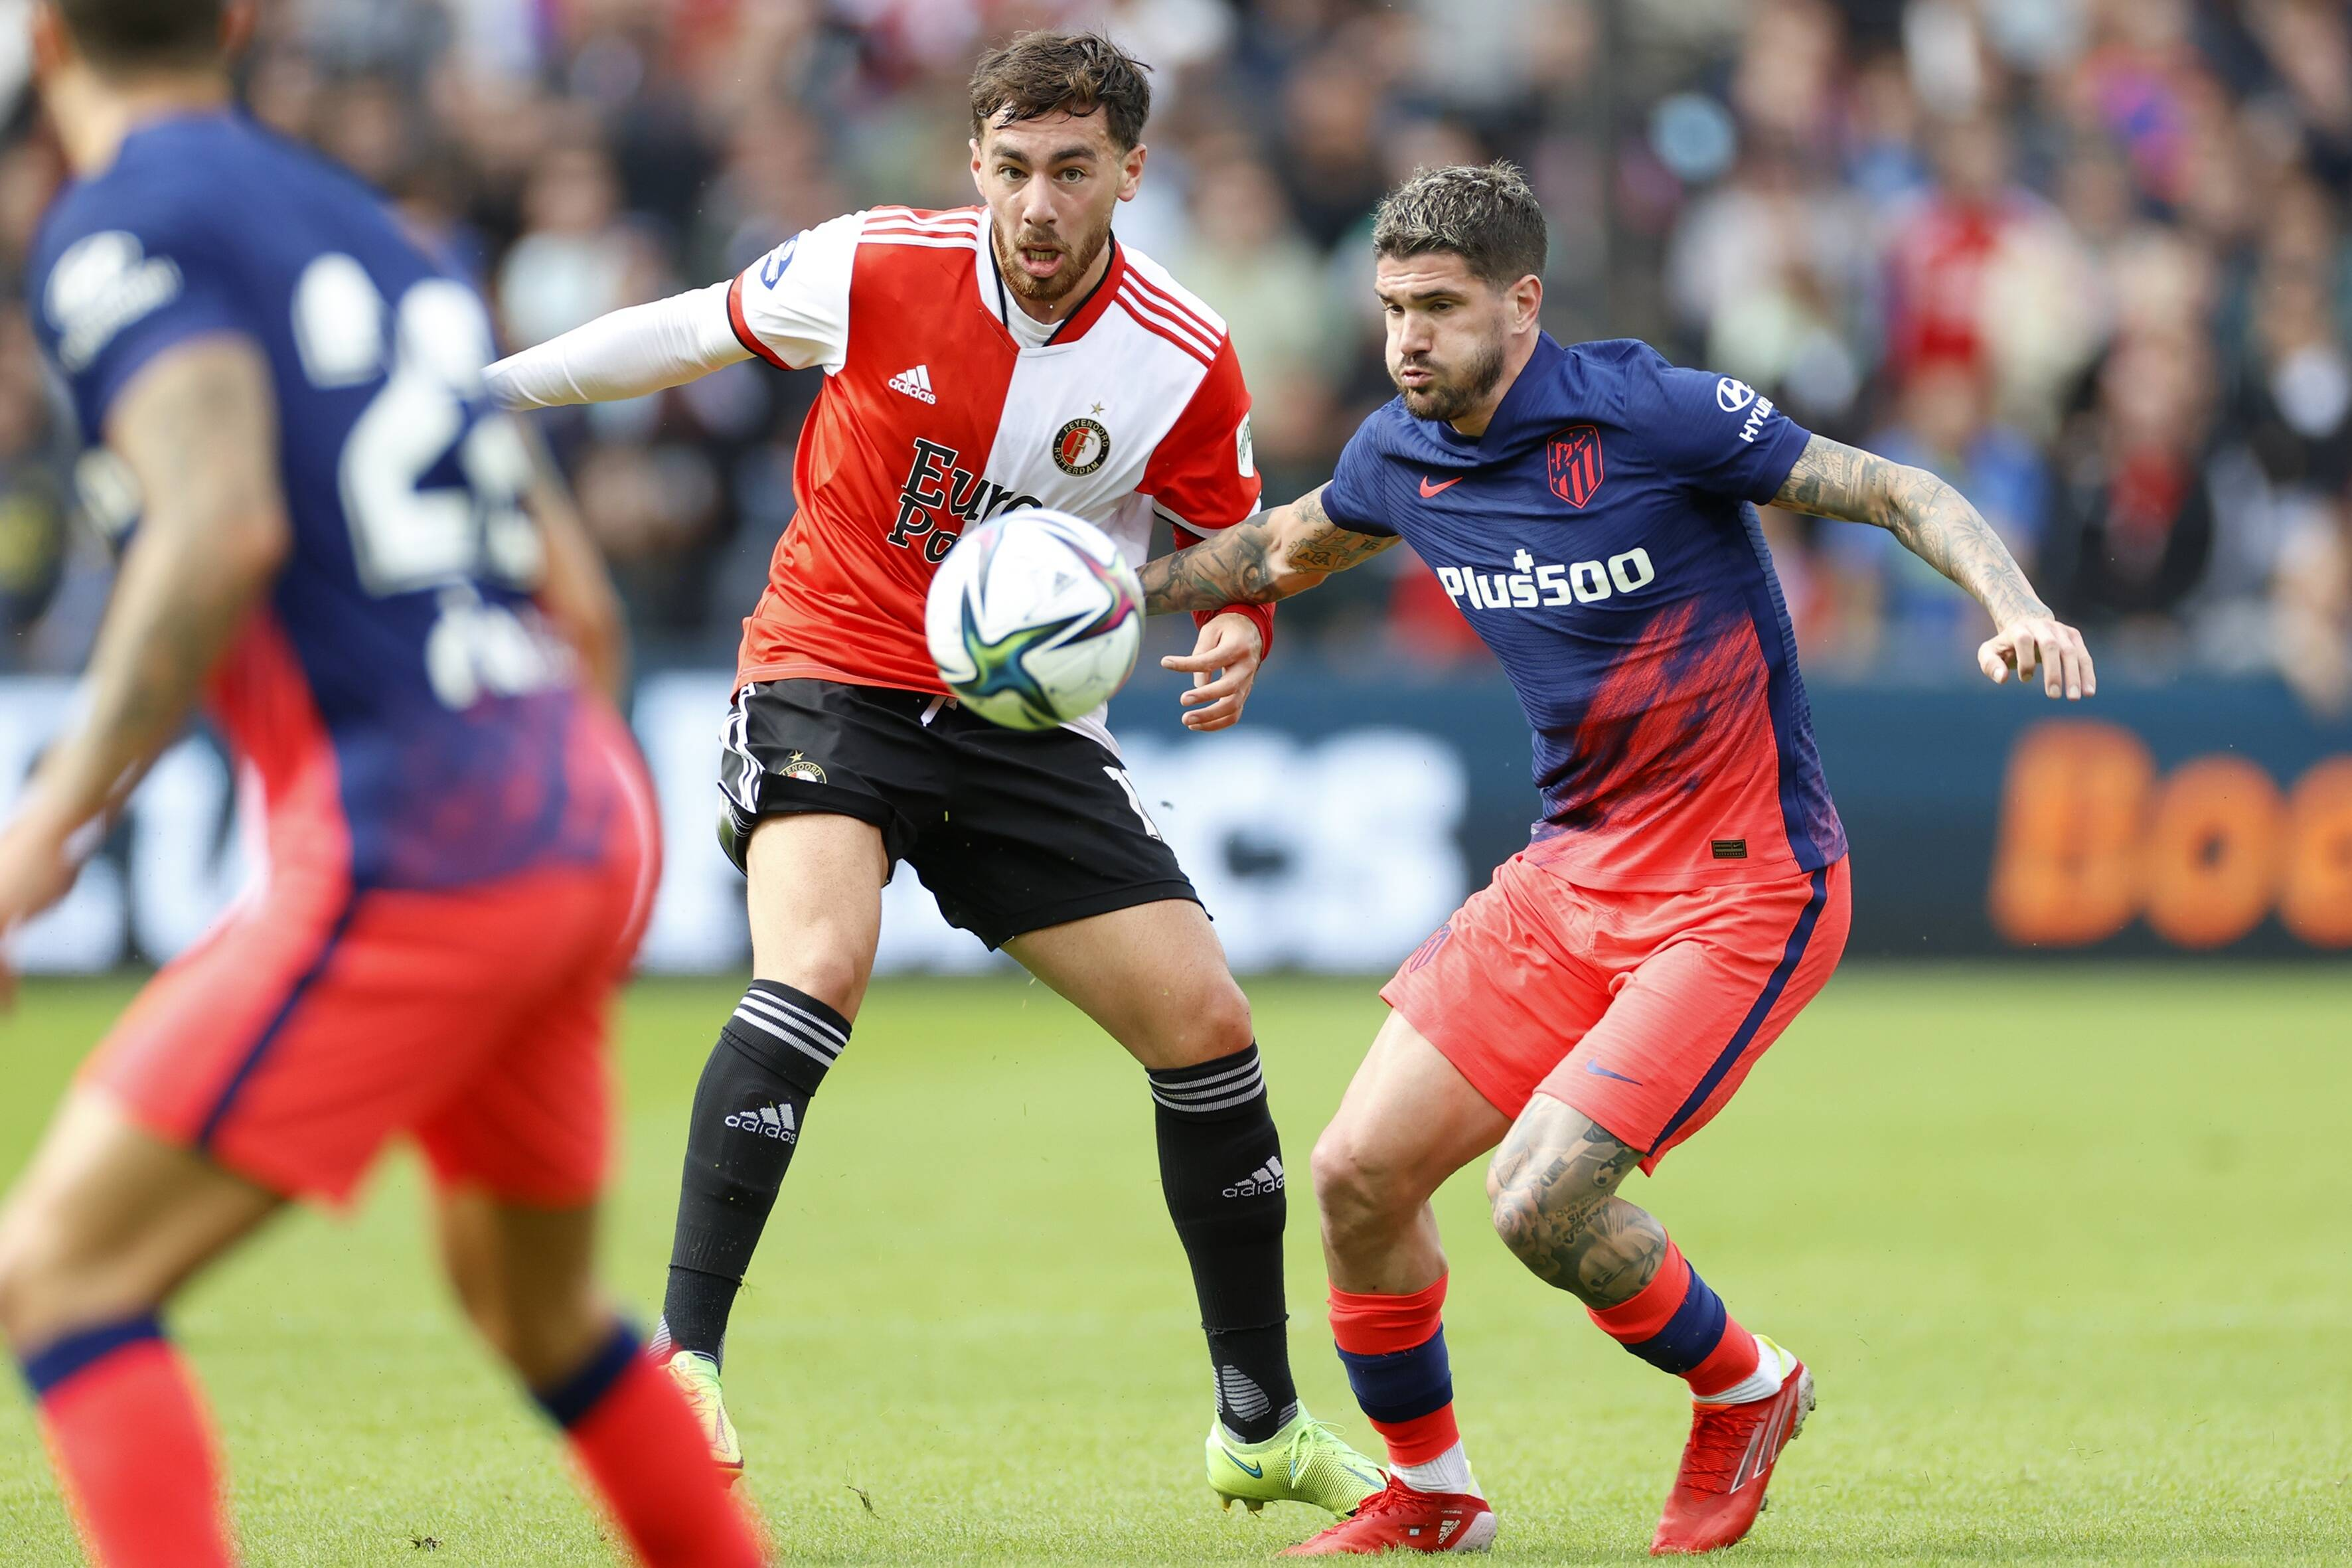 Atletico Madrid register Rodrigo de Paul ahead of La Liga opener despite financial issues